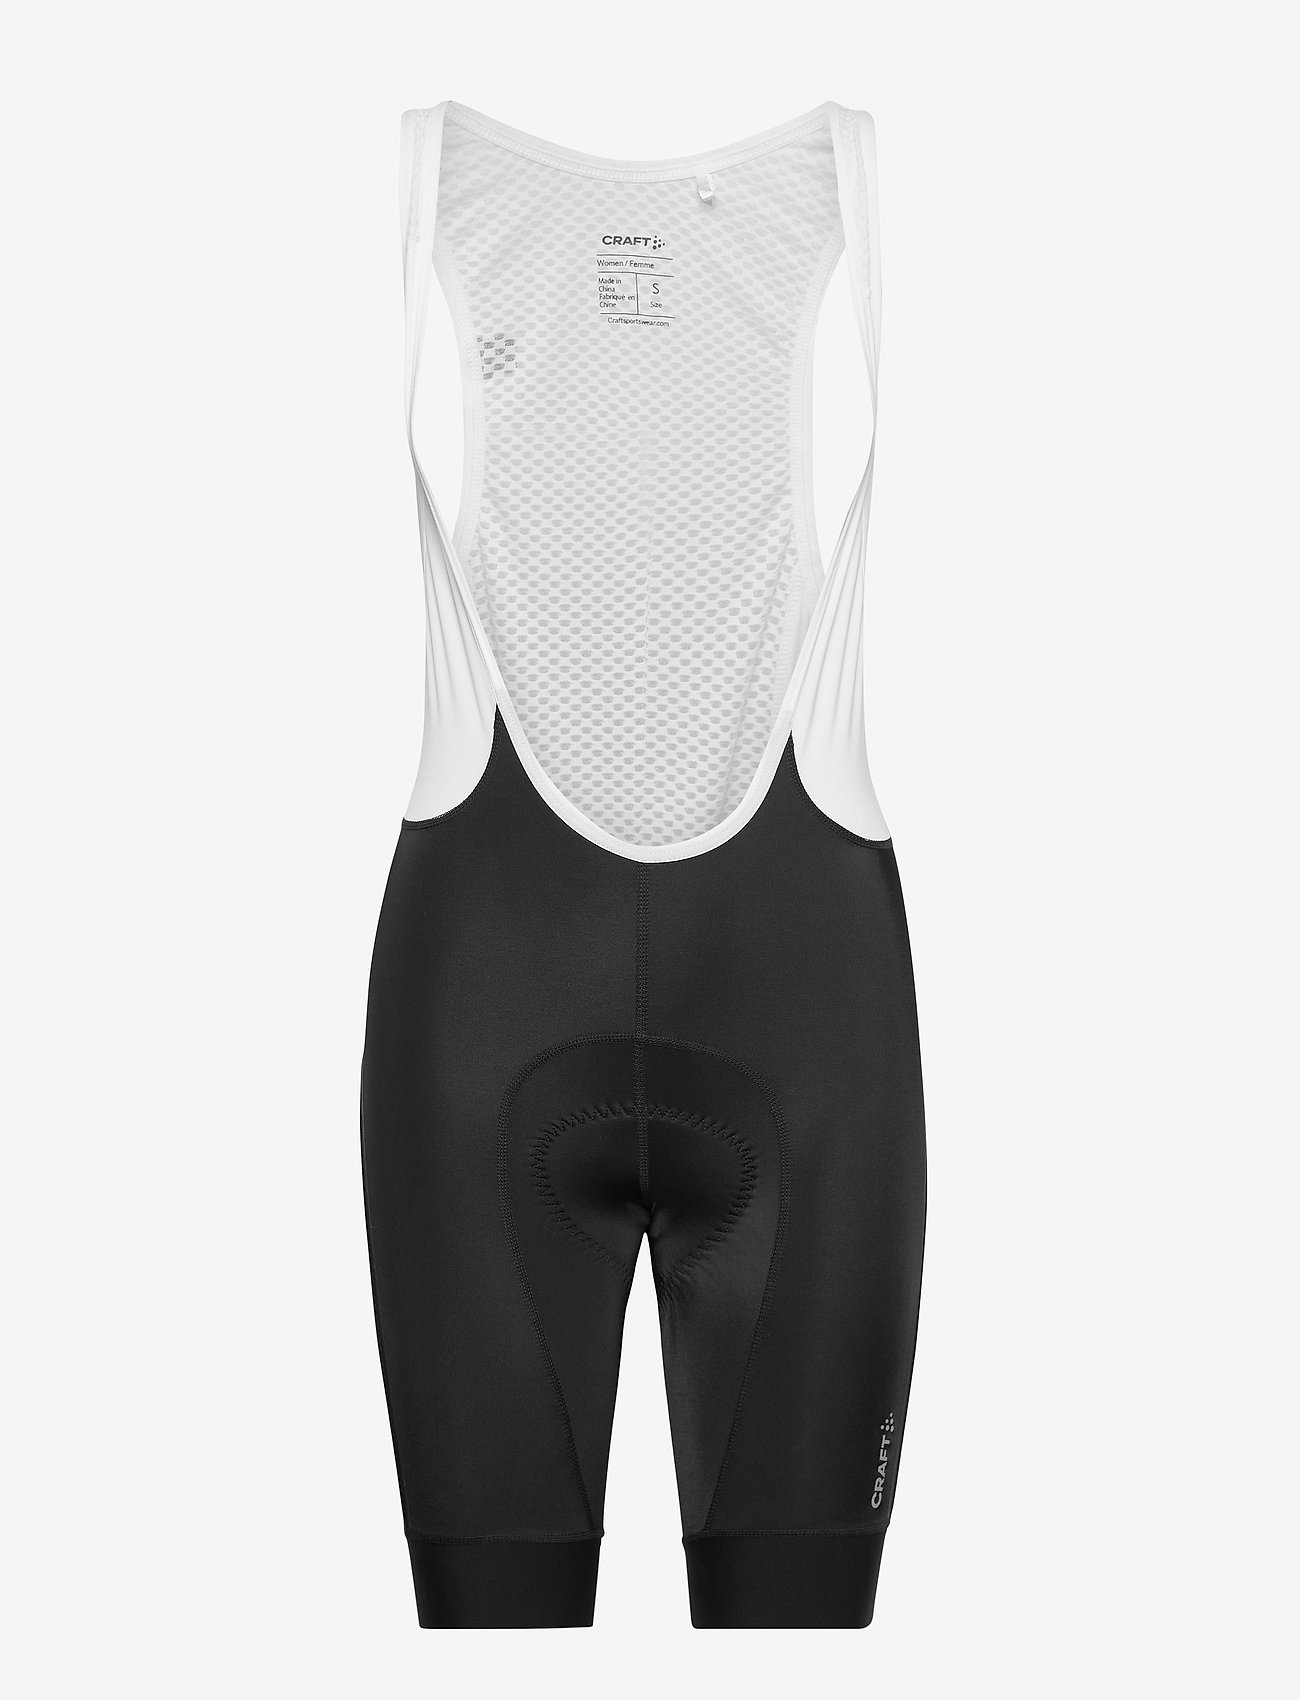 Craft - Adv Endur Bib Shorts W - wielrenshorts & -leggings - black - 0